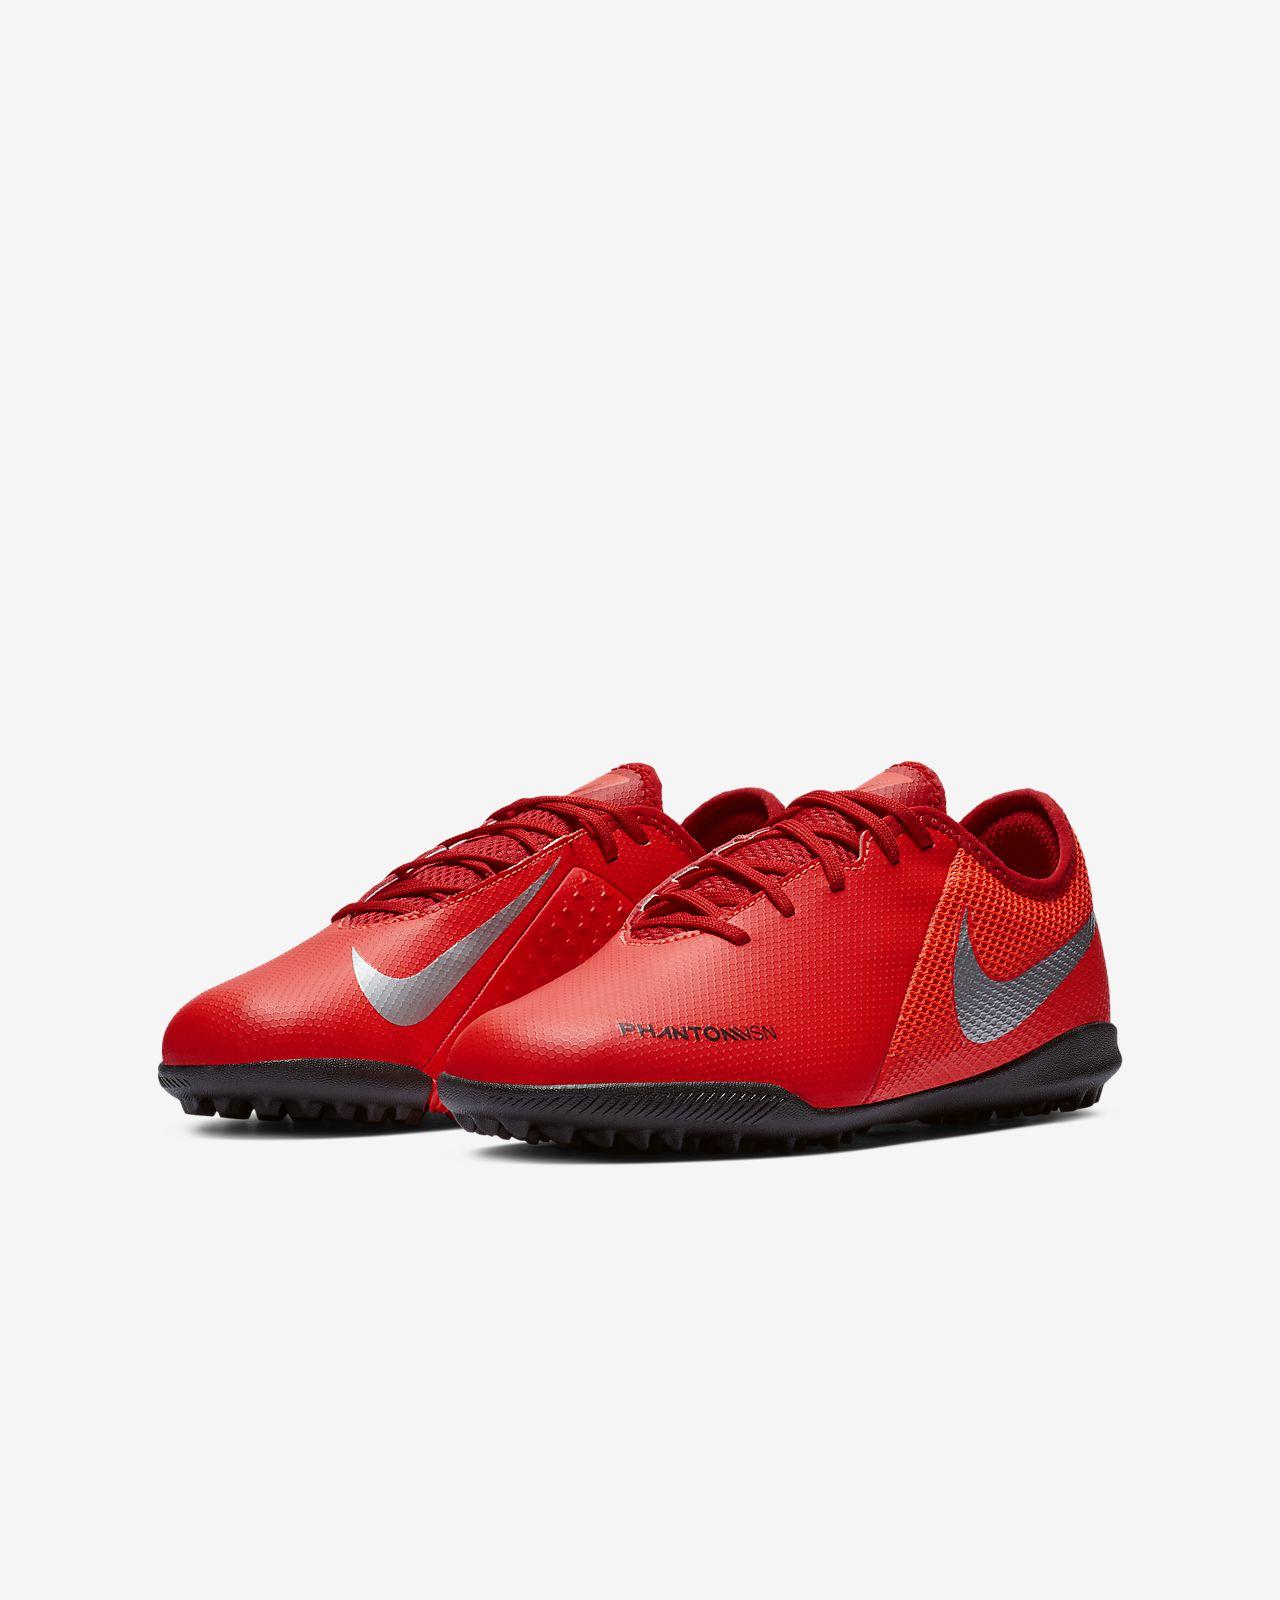 good 1e7fd 7a419 ... Nike Jr. PhantomVSN Academy Game Over TF Younger Older Kids  Turf Football  Shoe